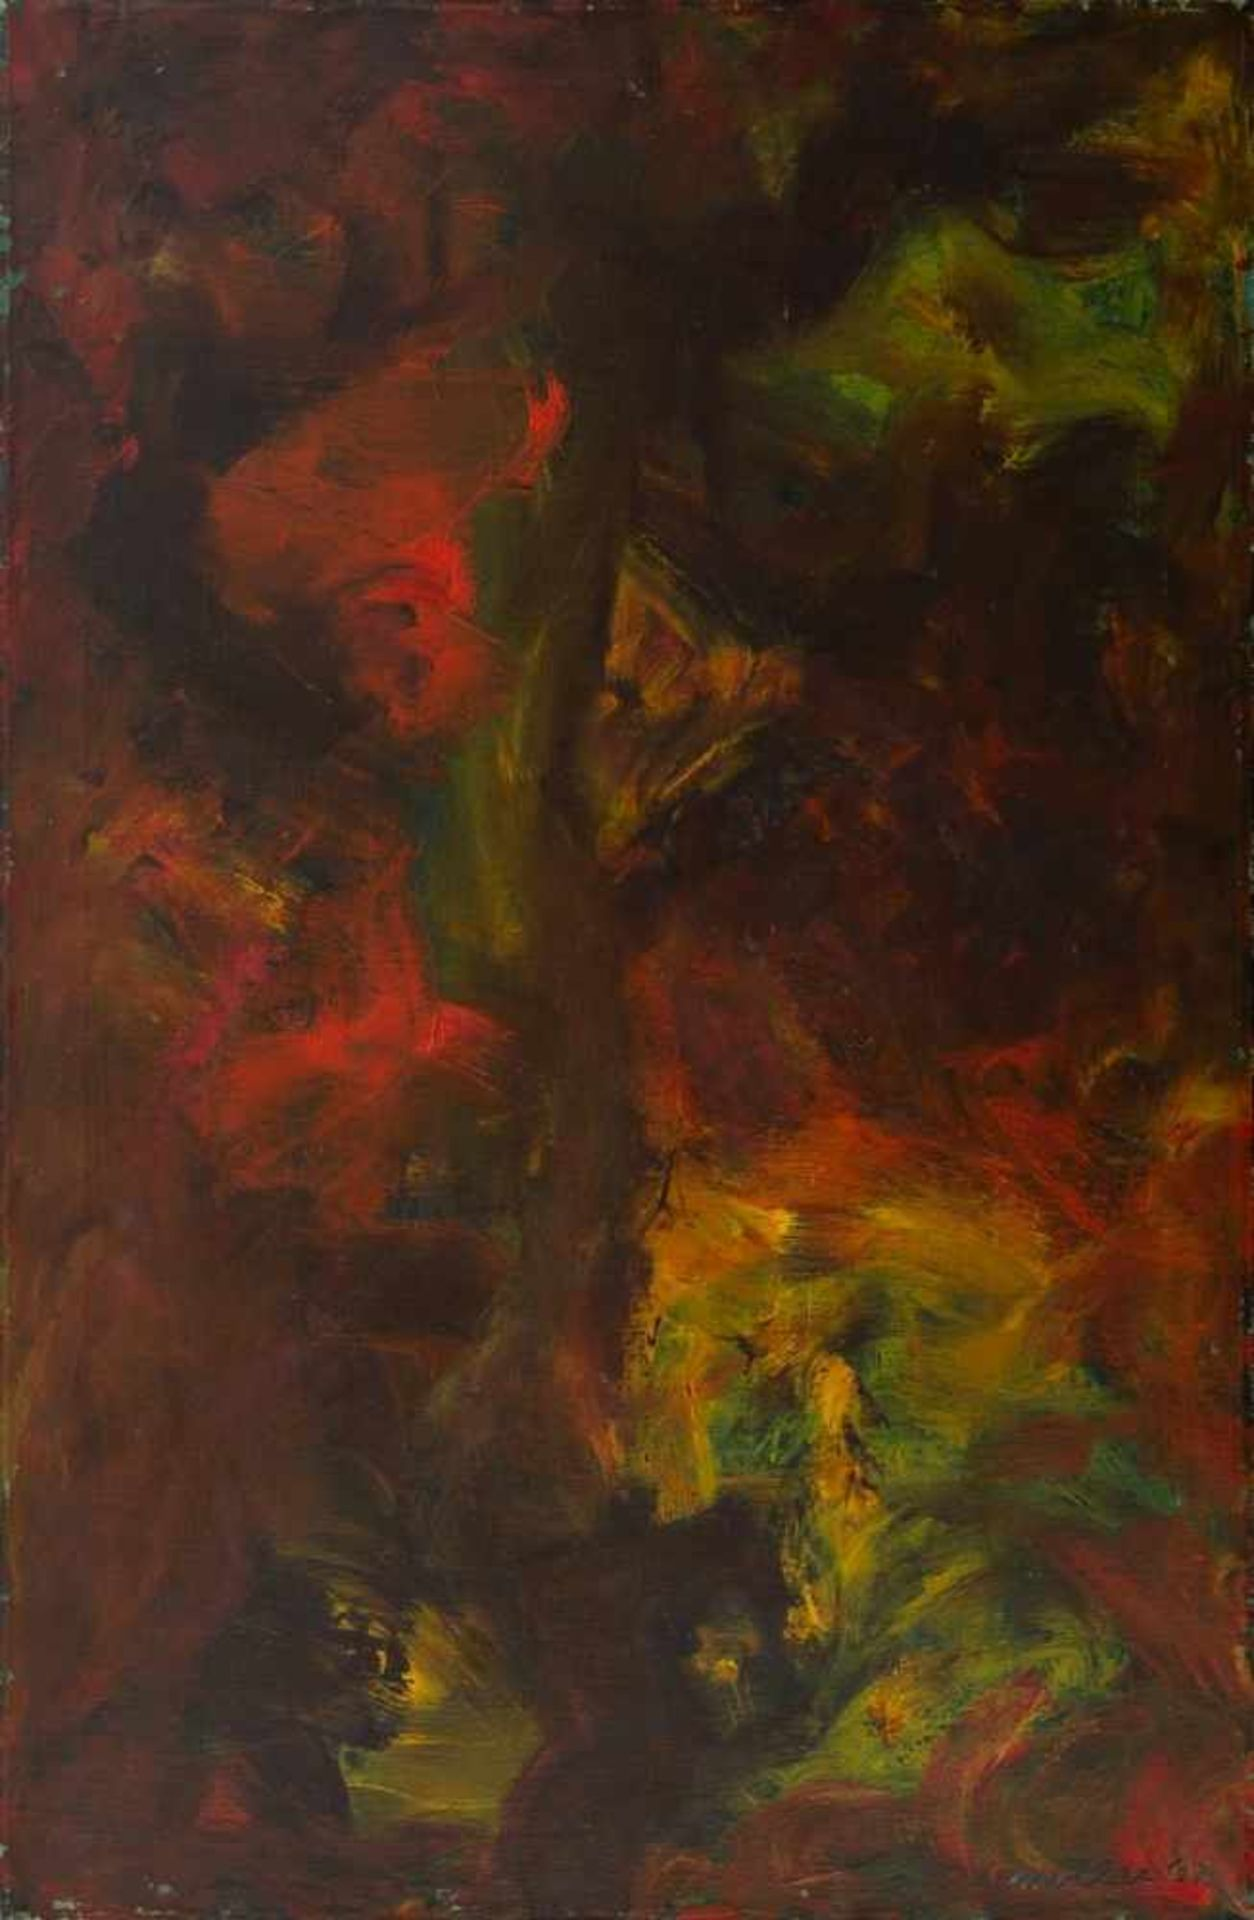 ANDREW MOLLES(1907 MIDDLETOWN, USA - 1975, ROHRAU, NÖ)o. T., 1962Öl auf Leinwand, 94 x 61,5